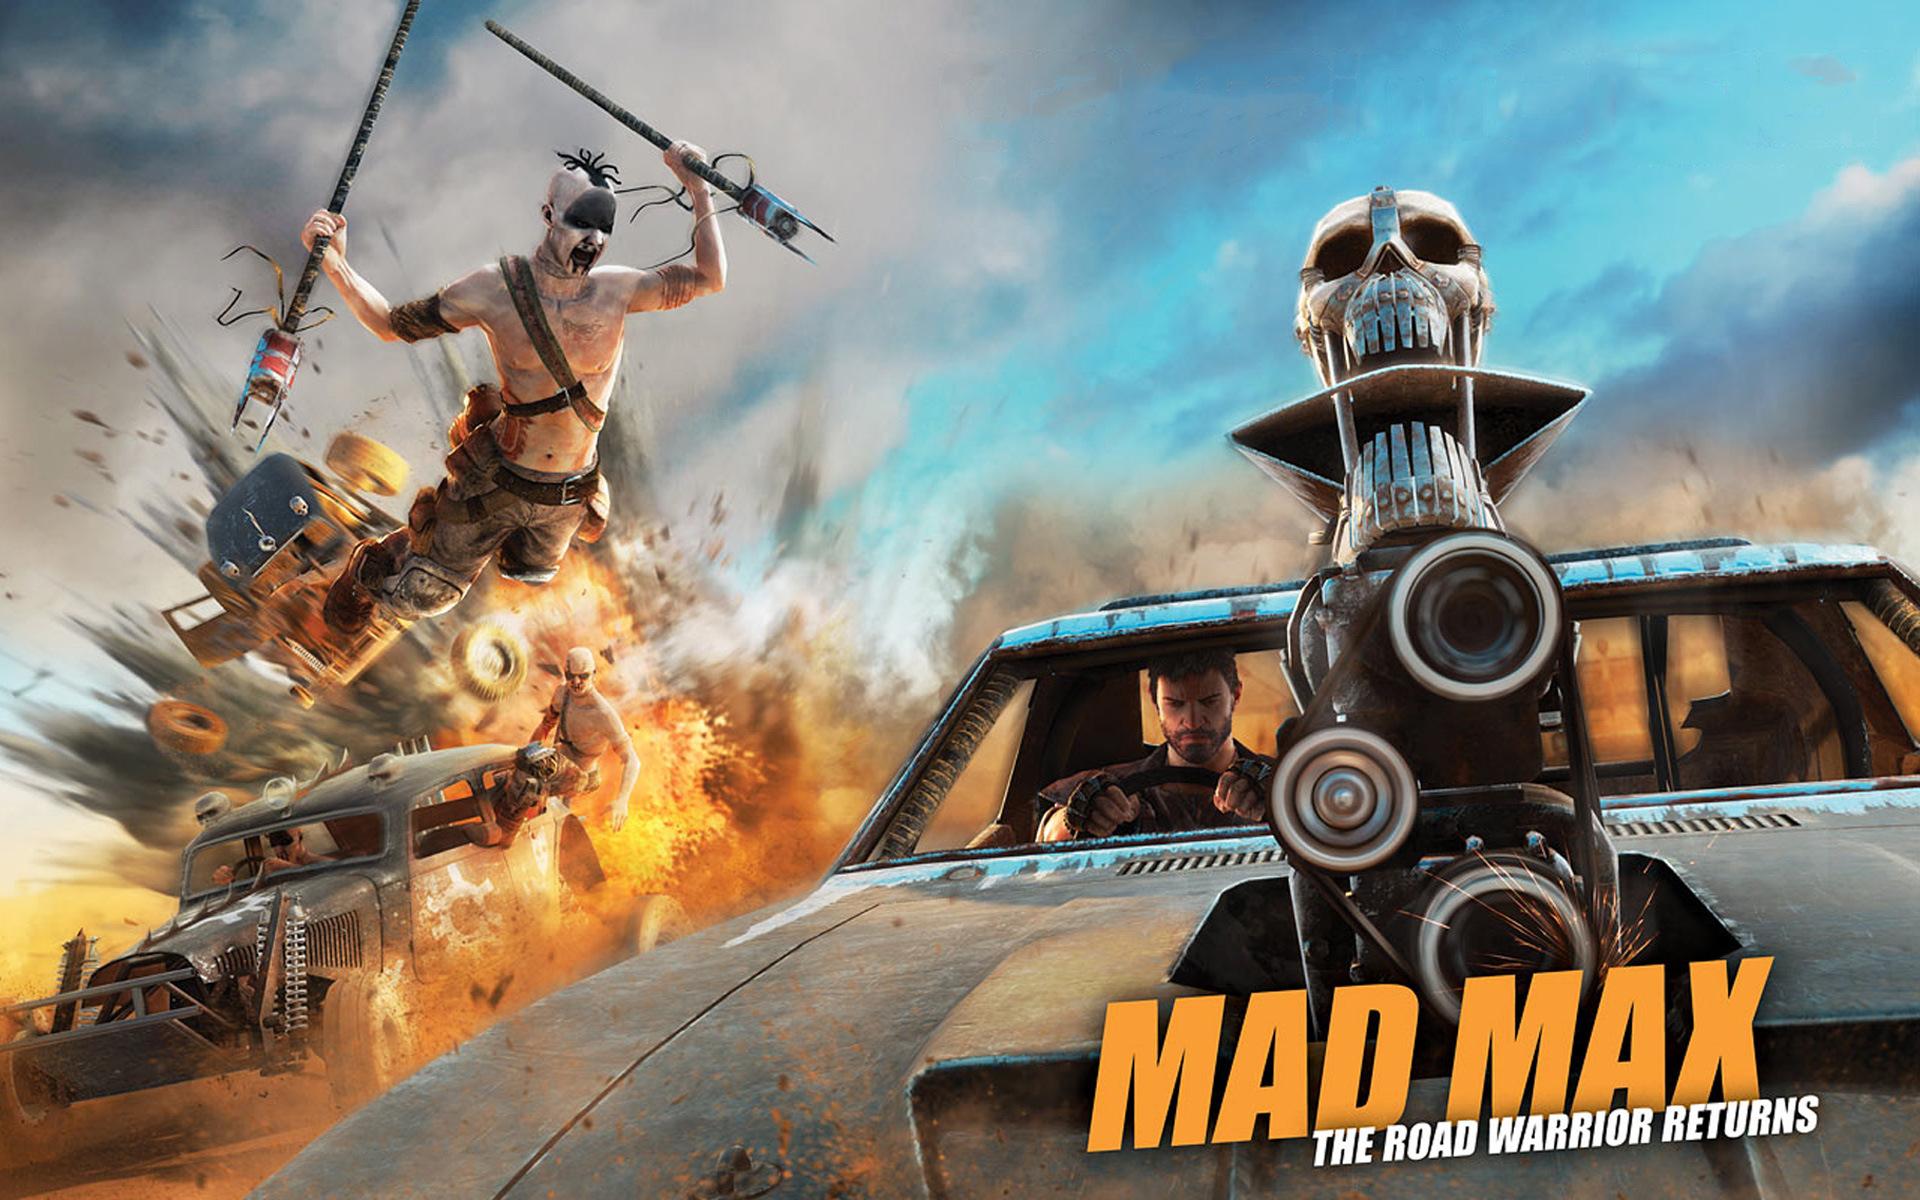 mad-max-09-1920x1200.jpg